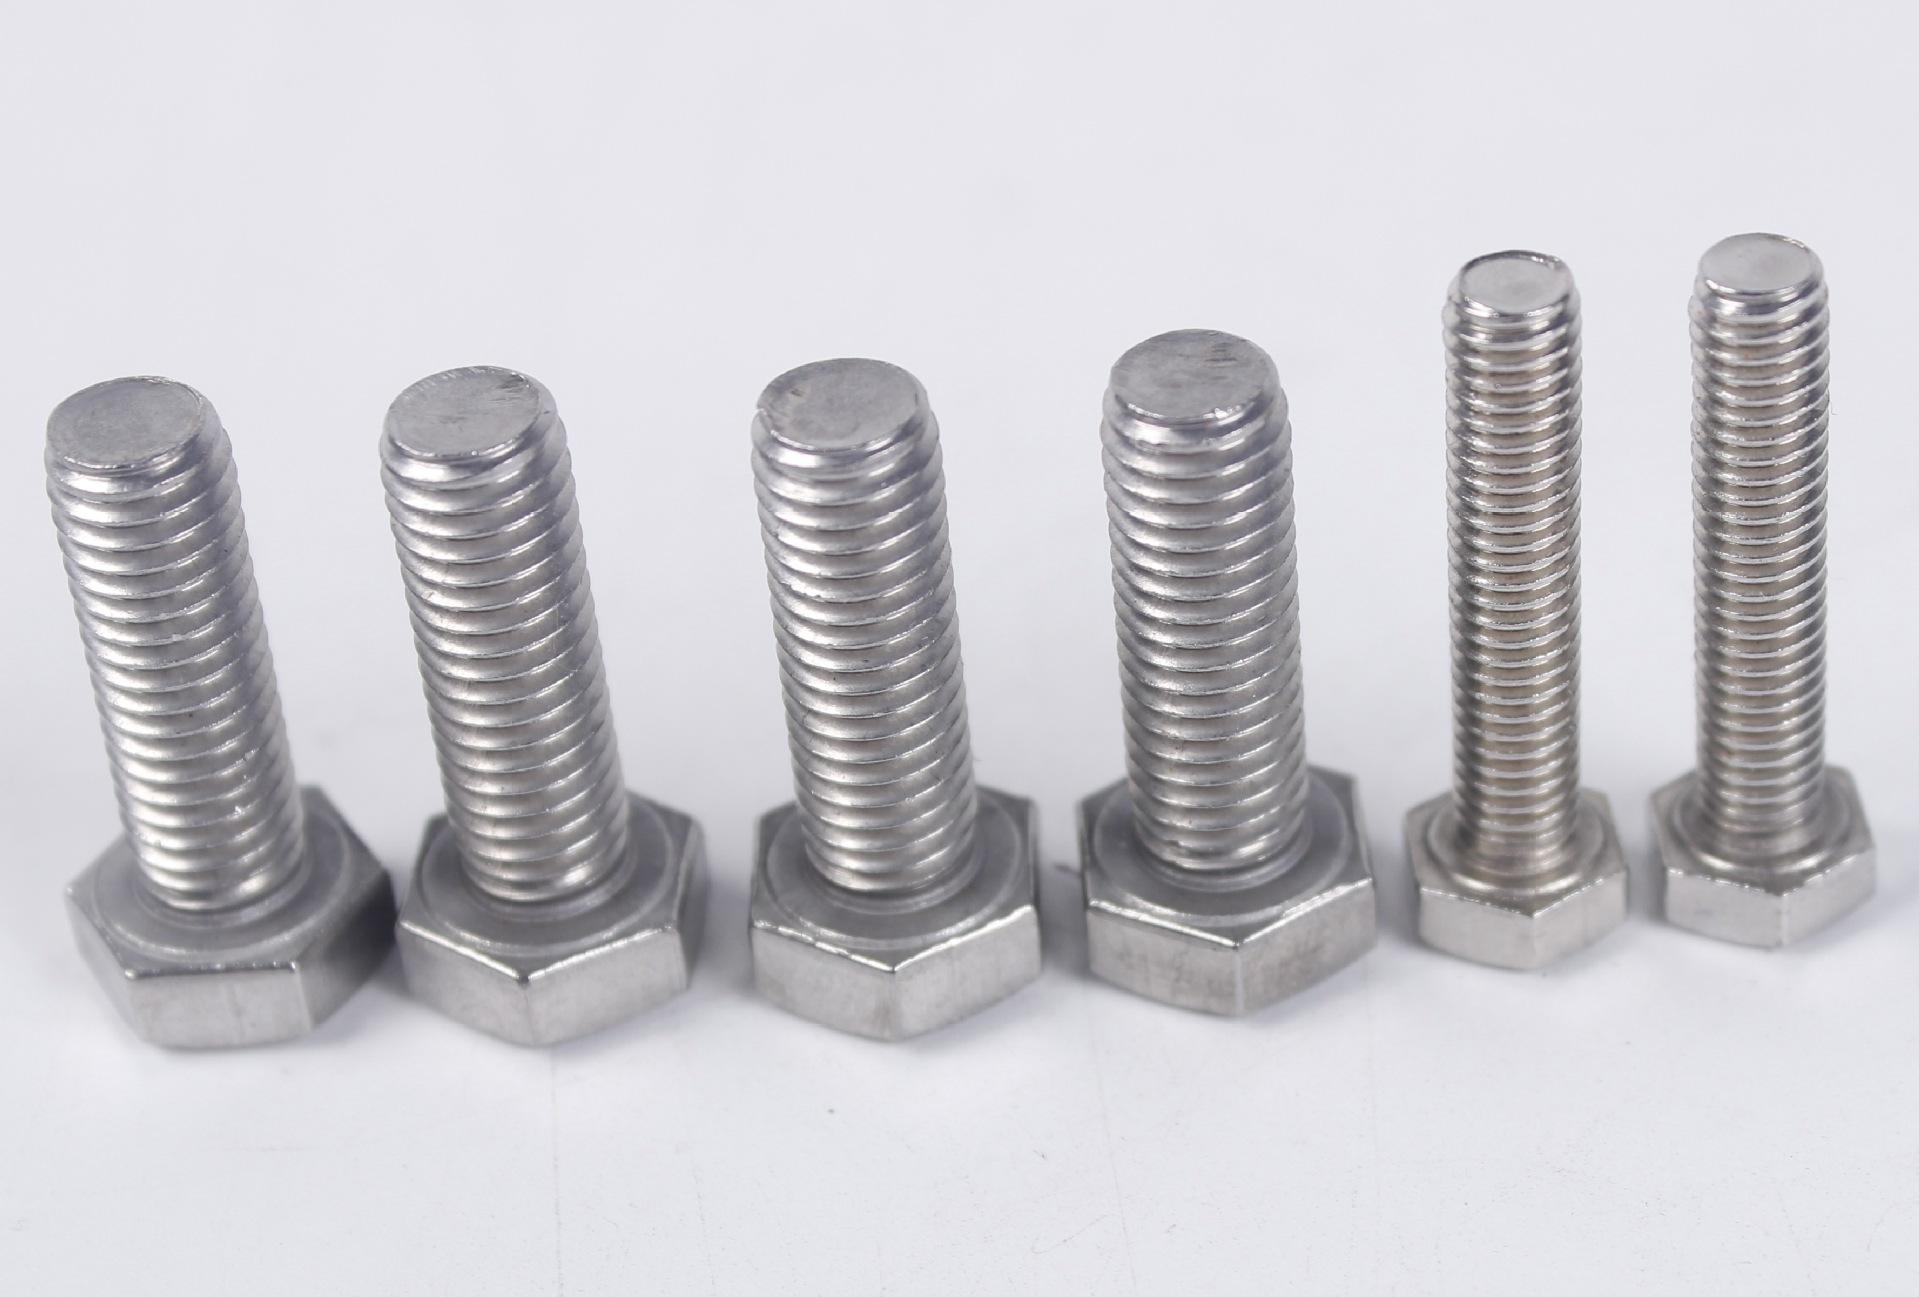 M12 外六角螺栓 304不锈钢螺丝 全牙螺栓 M12*16-12*260  DIN933